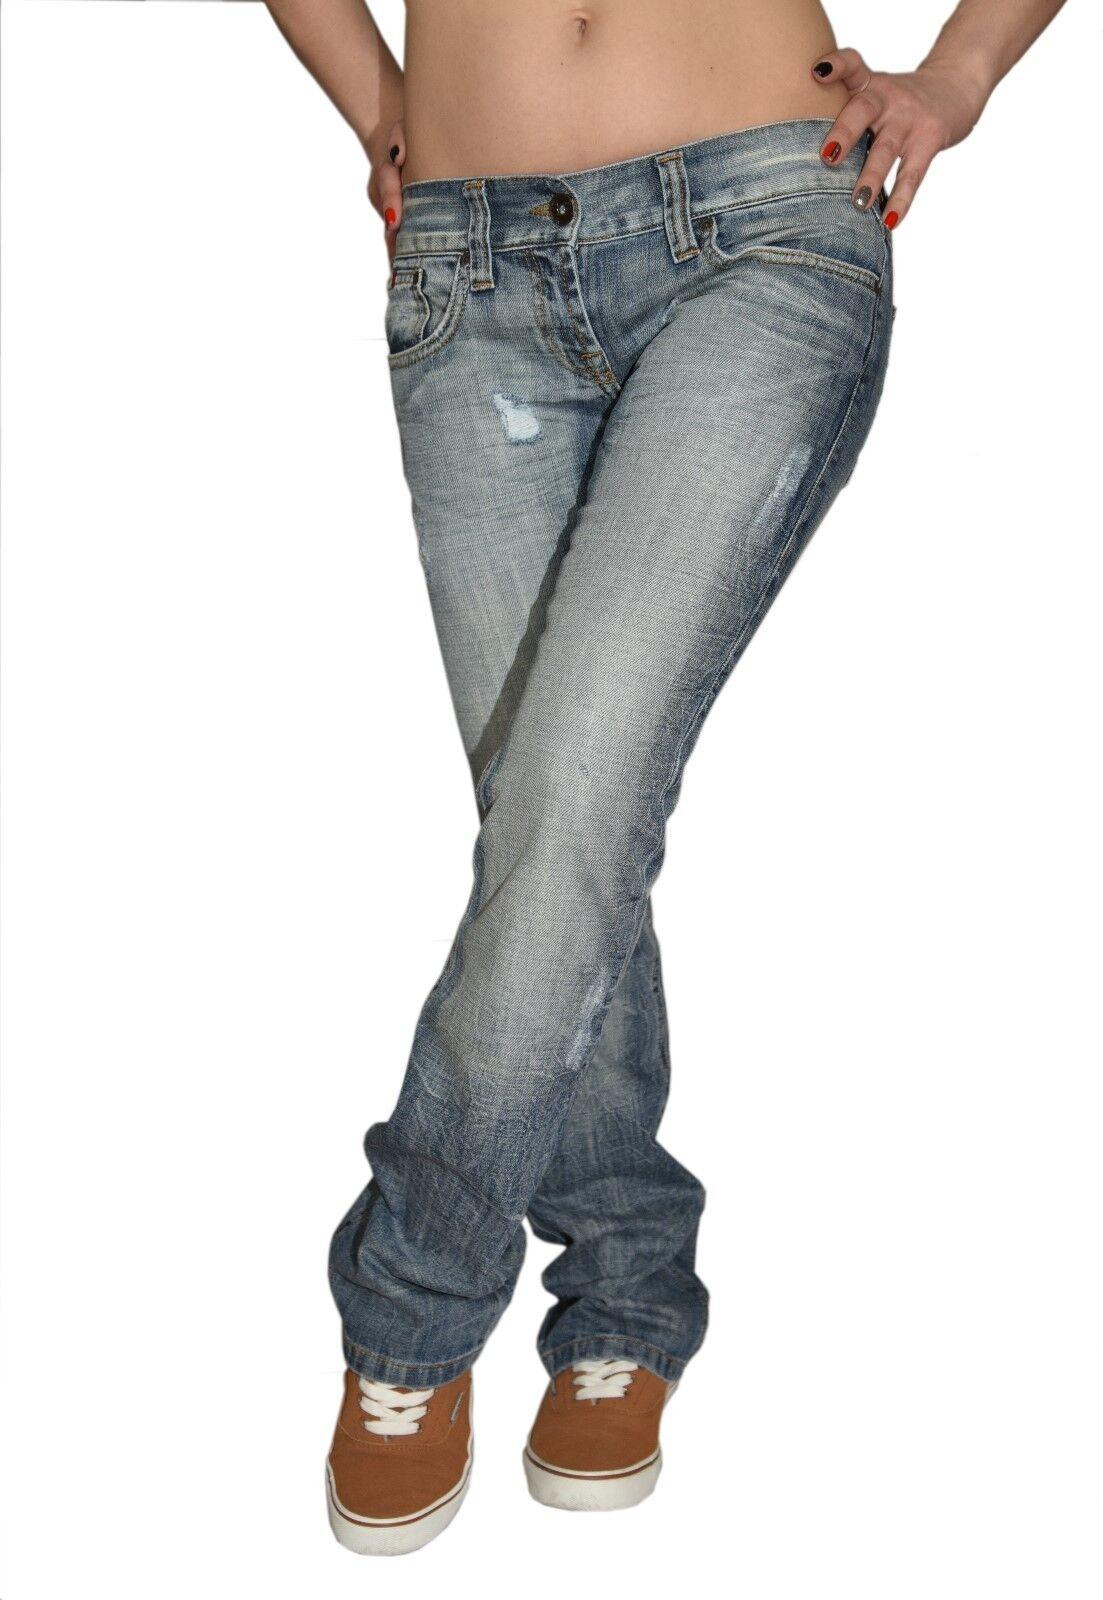 Mädchen Jeans Hüfthose Bootcut Hellblau Gr. W24-W26 158 164 XXS Decon-7787-